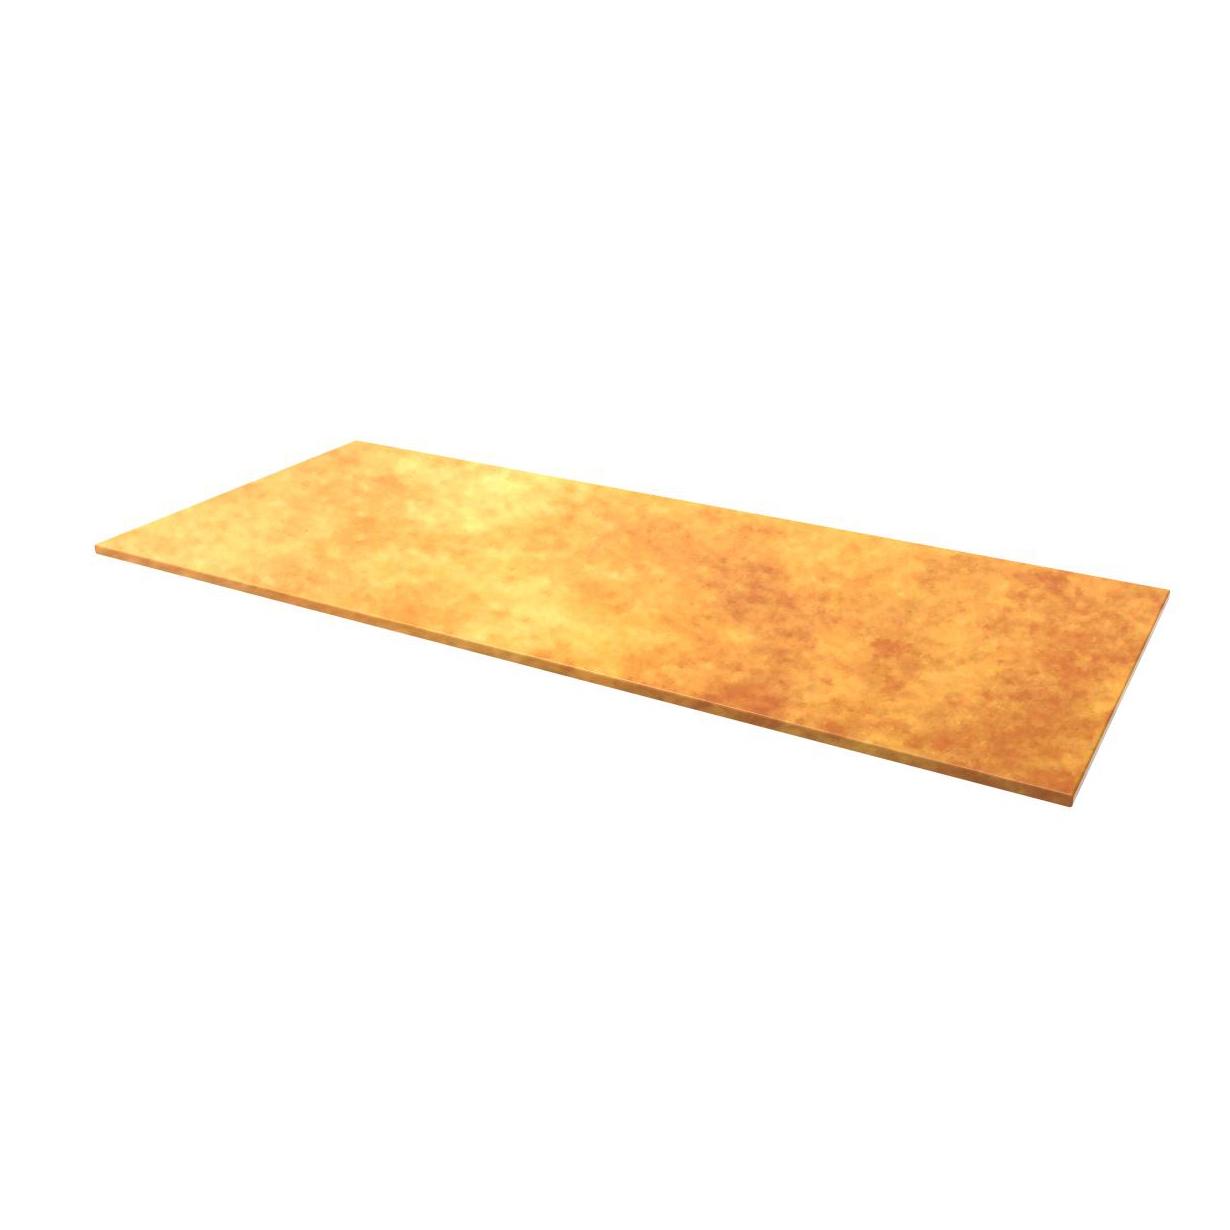 Hoshizaki HS-5271 cutting boards